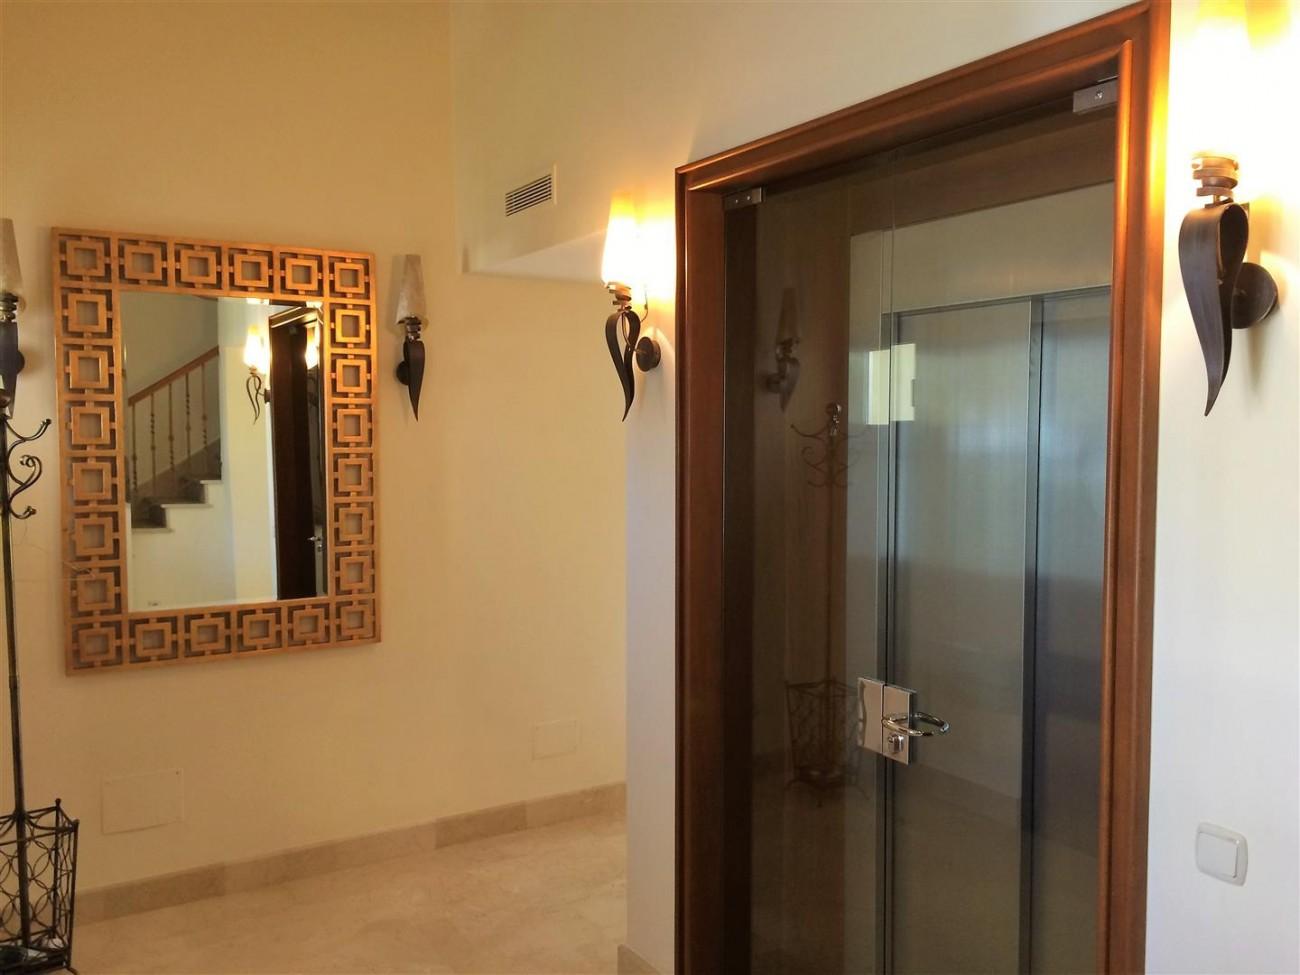 Penthouse for sale Las Alamandas Nueva Andalucia Marbella Spain (12) (Large)